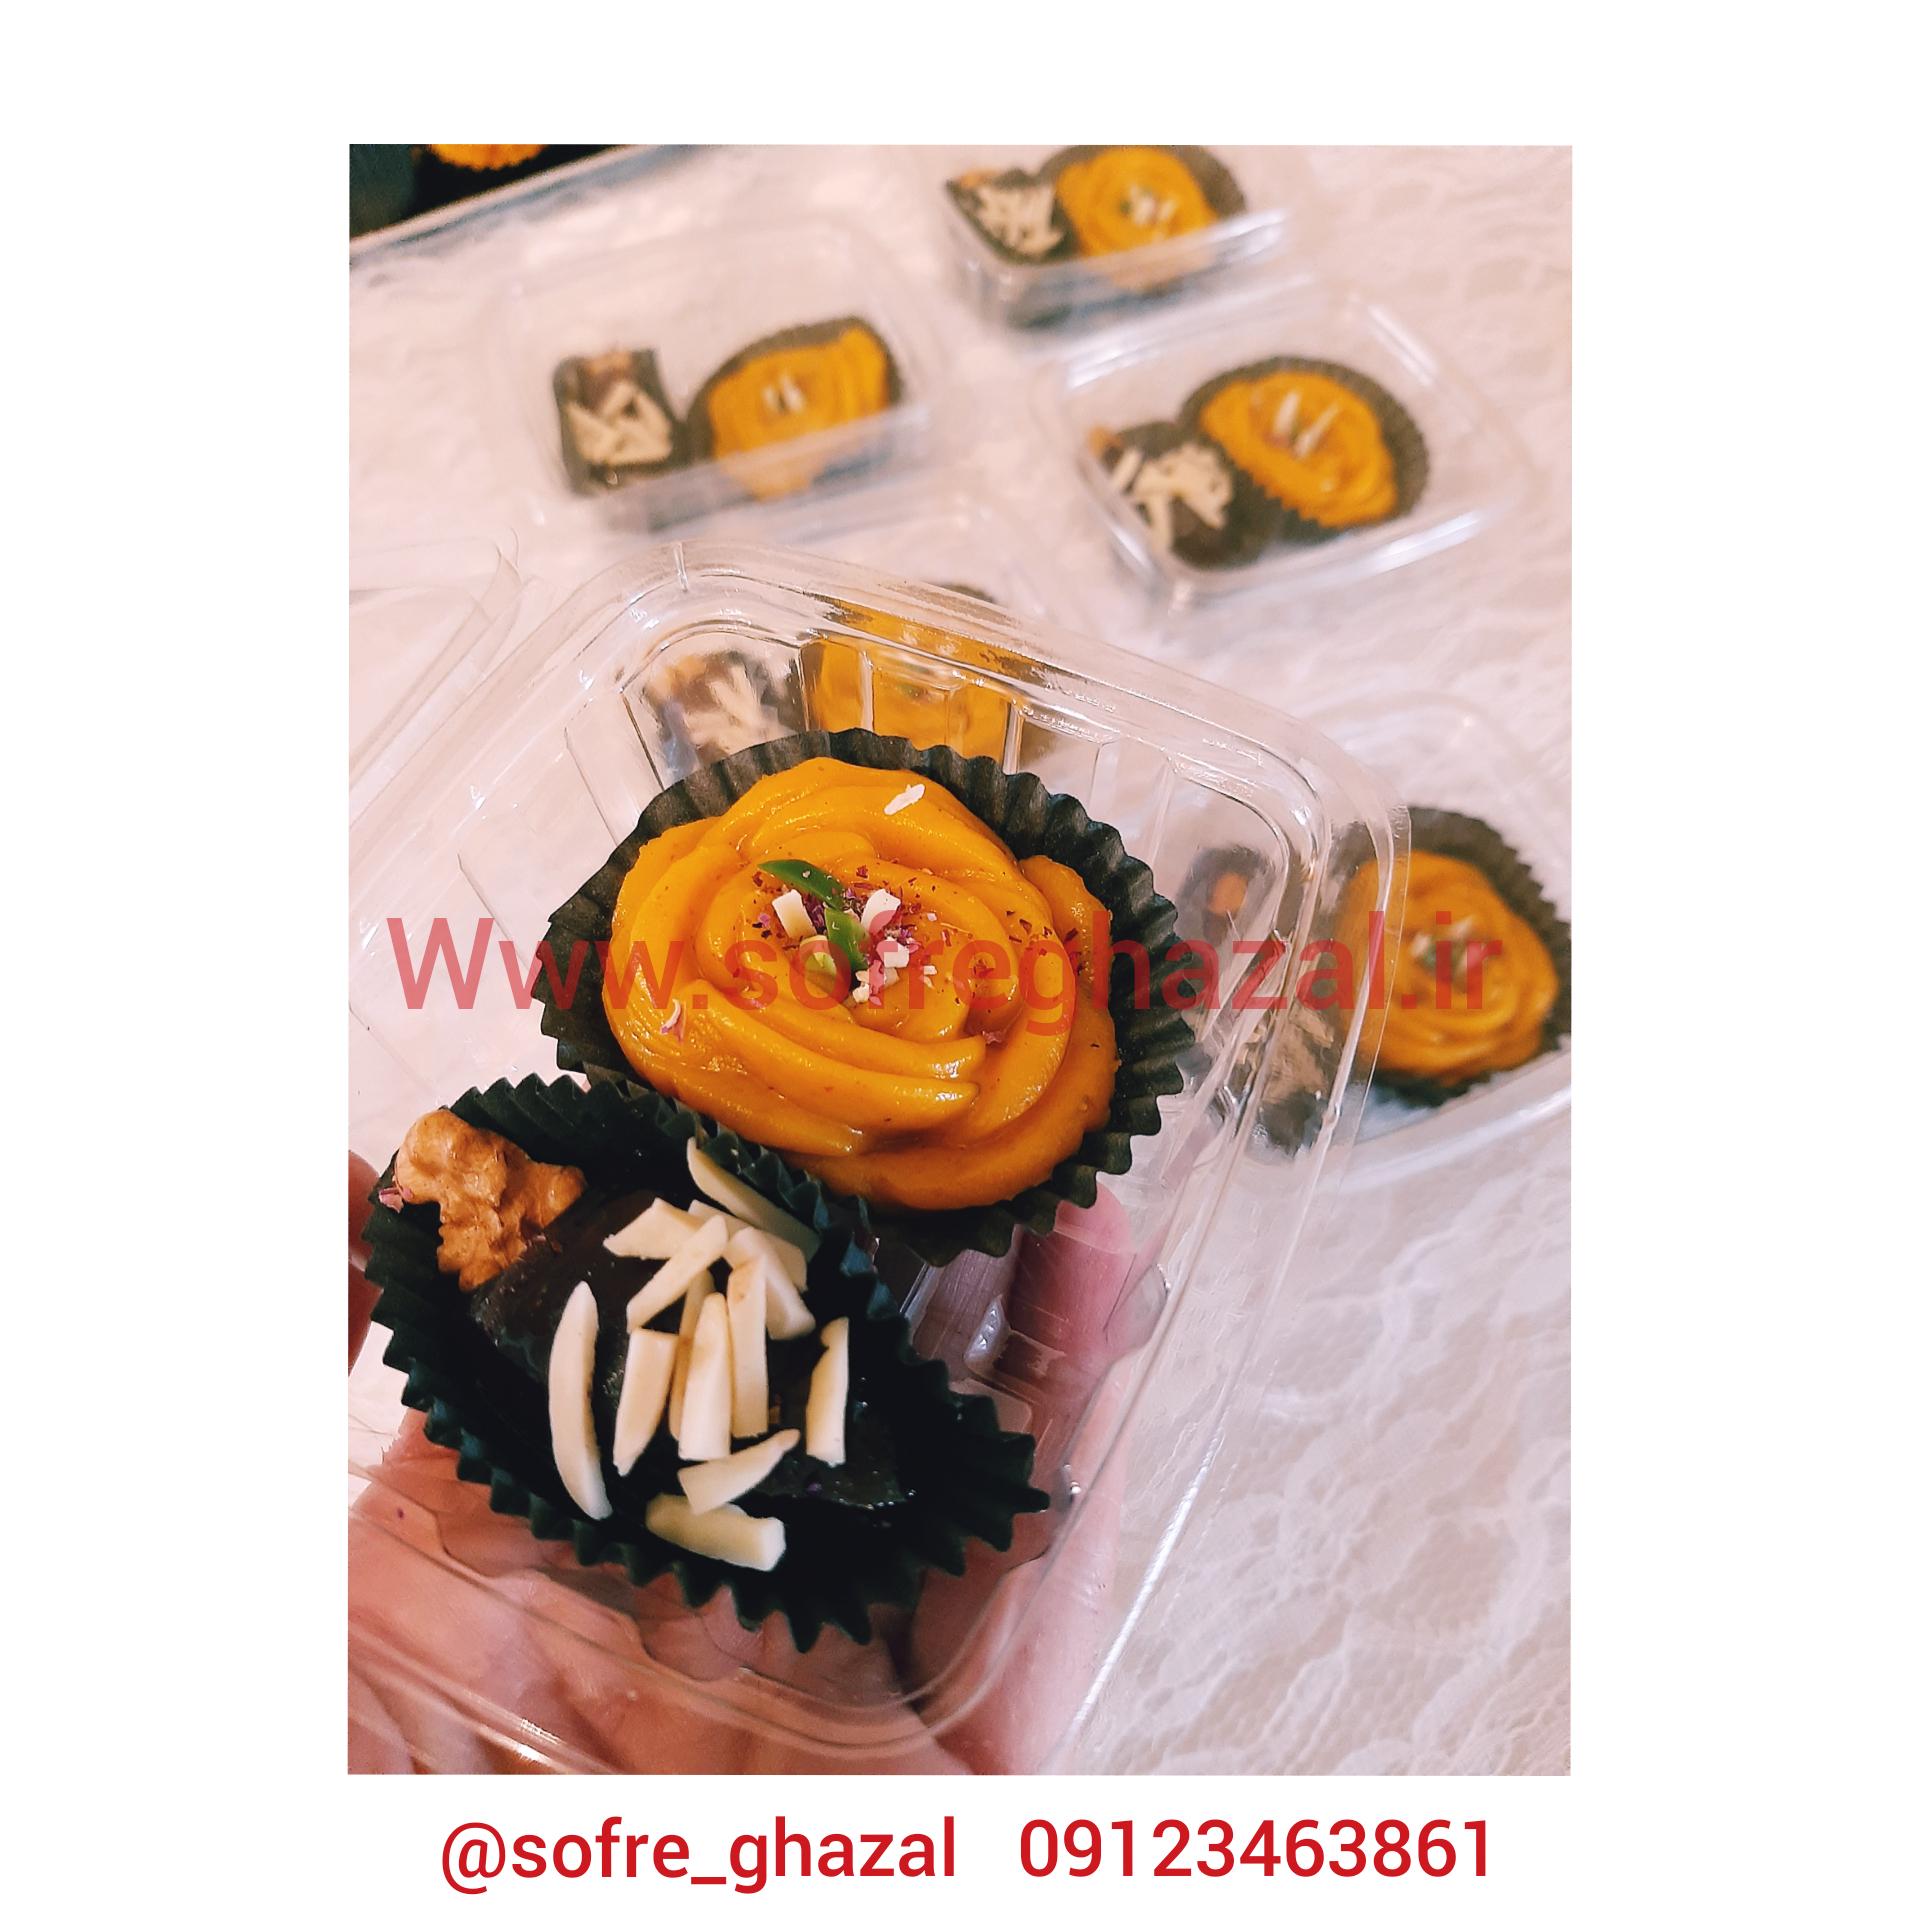 PhotoCollage_20210107_160558241